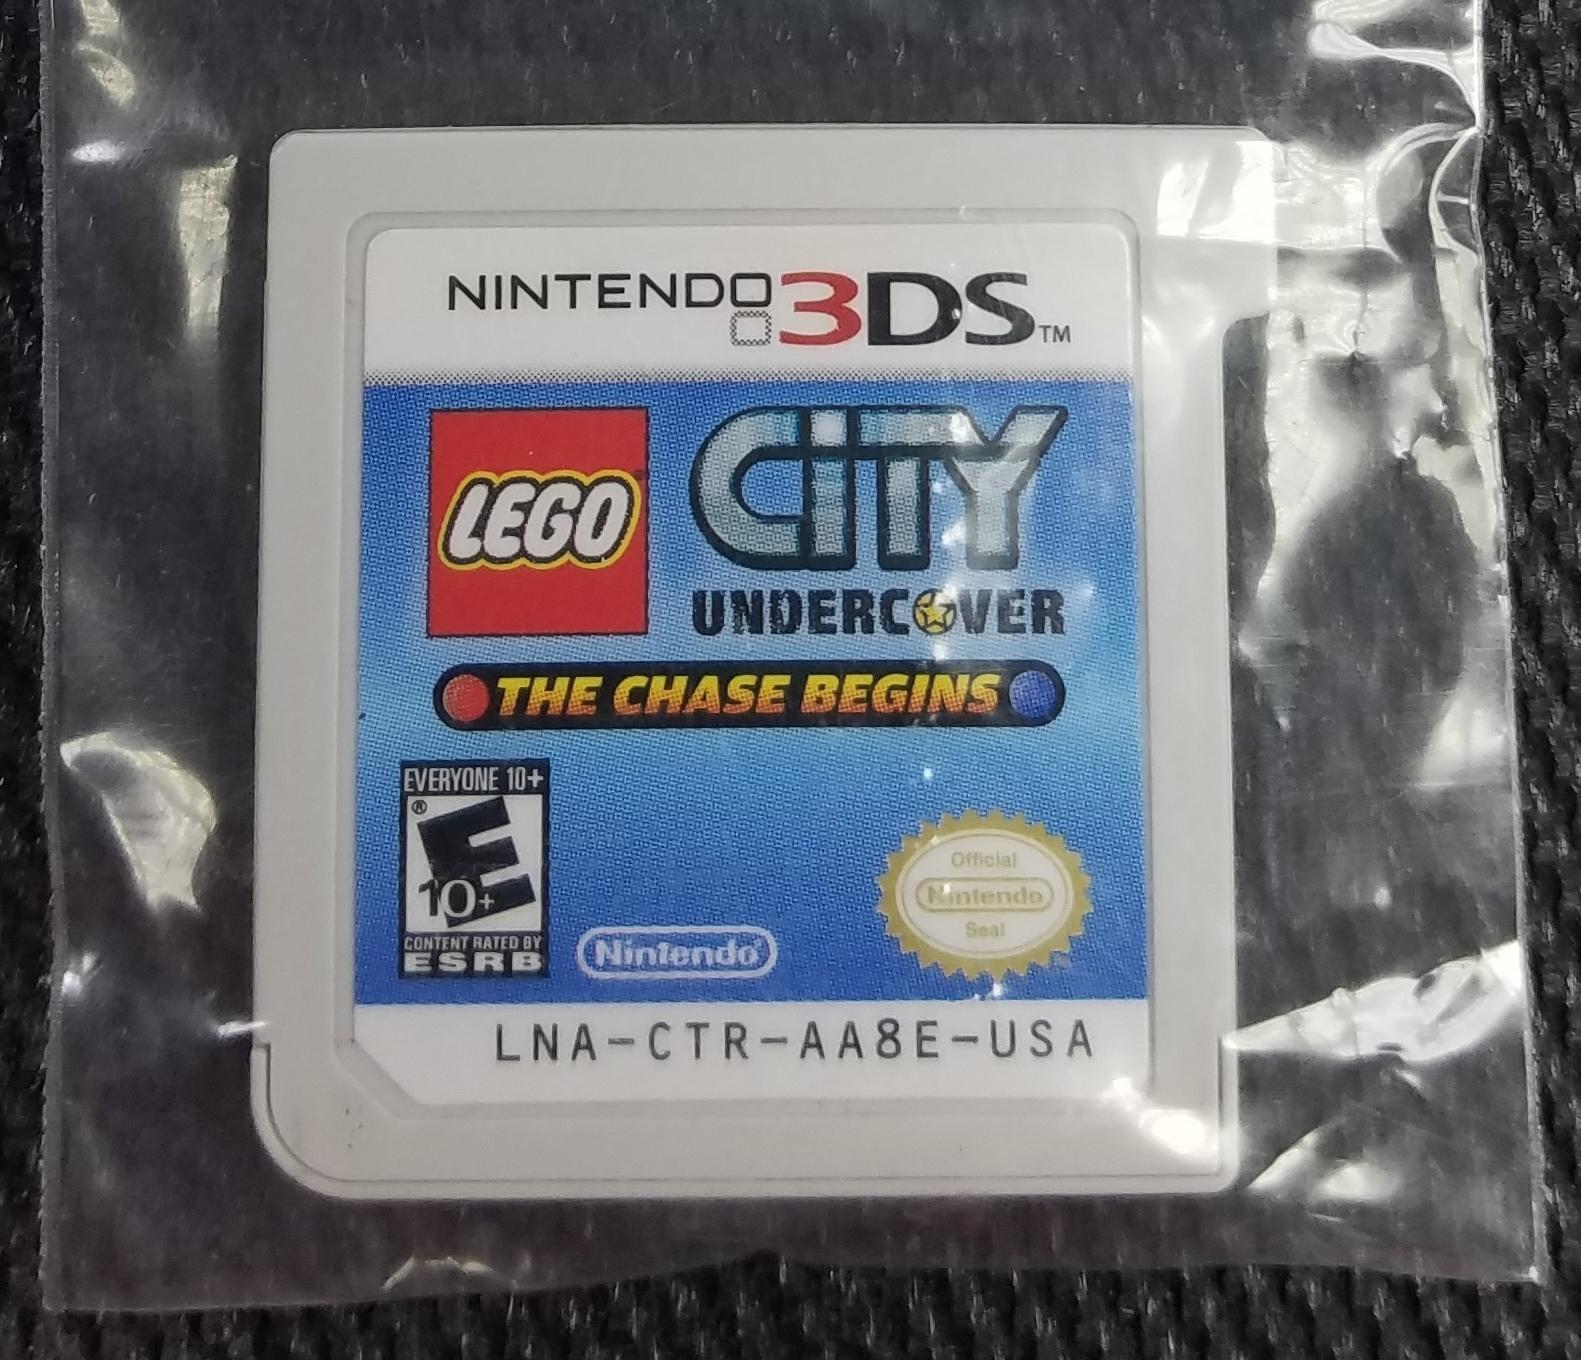 NINTENDO 3DS LEGO CITY UNDERCOVER